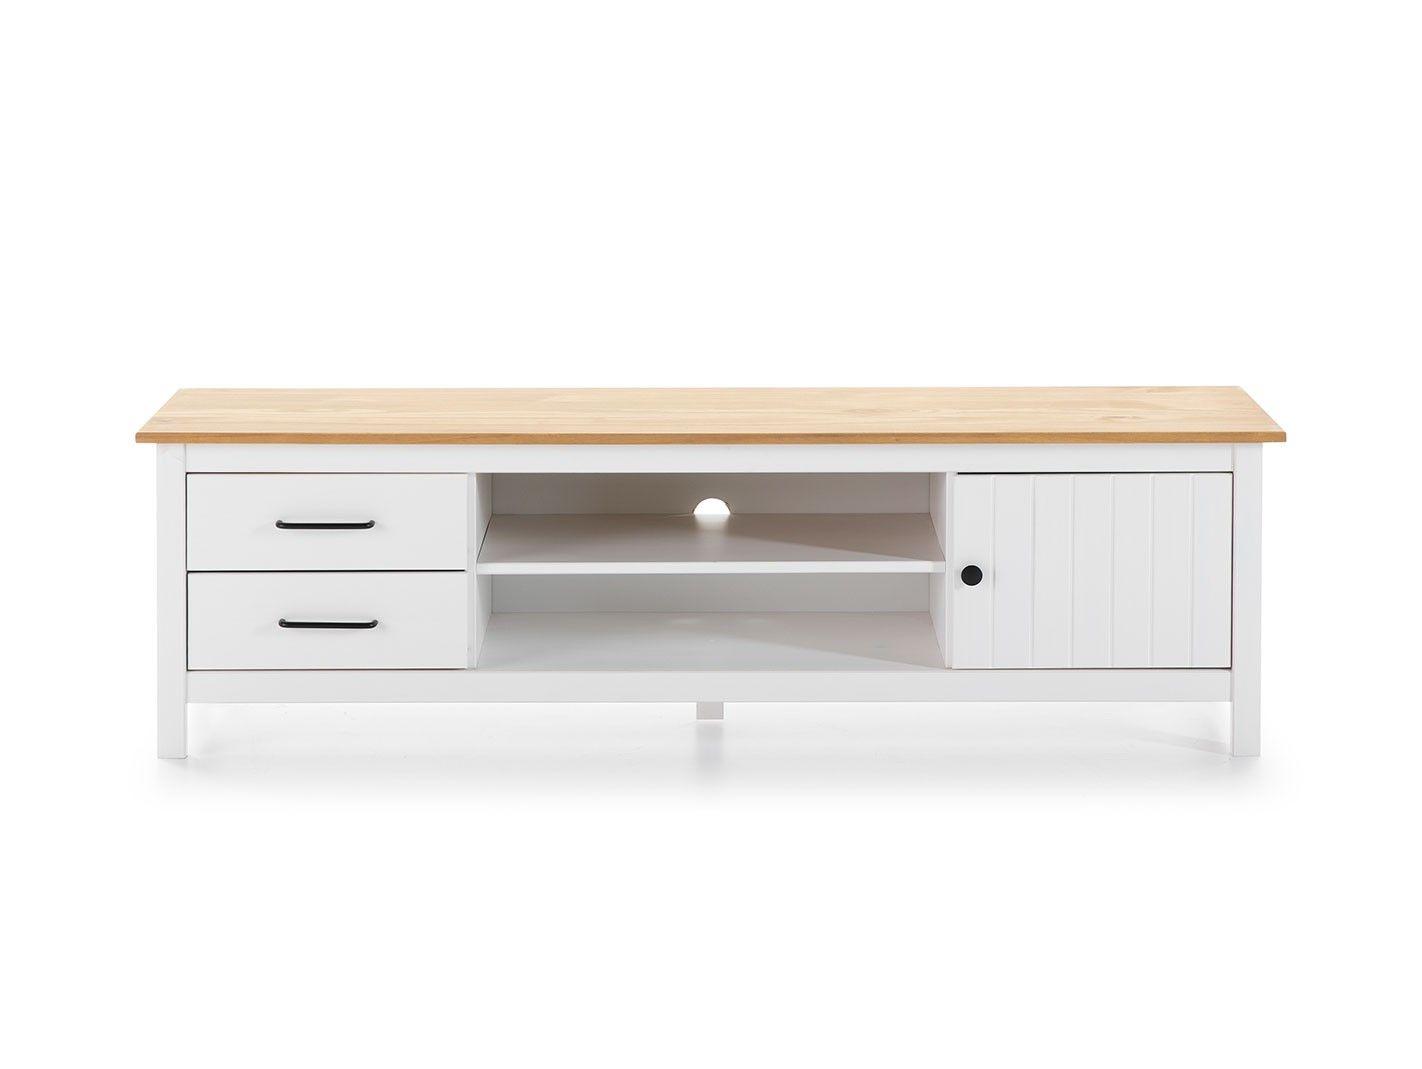 Muebles babel asturias obtenga ideas dise o de muebles para su hogar aqu - Mueble zapatero a medida ...